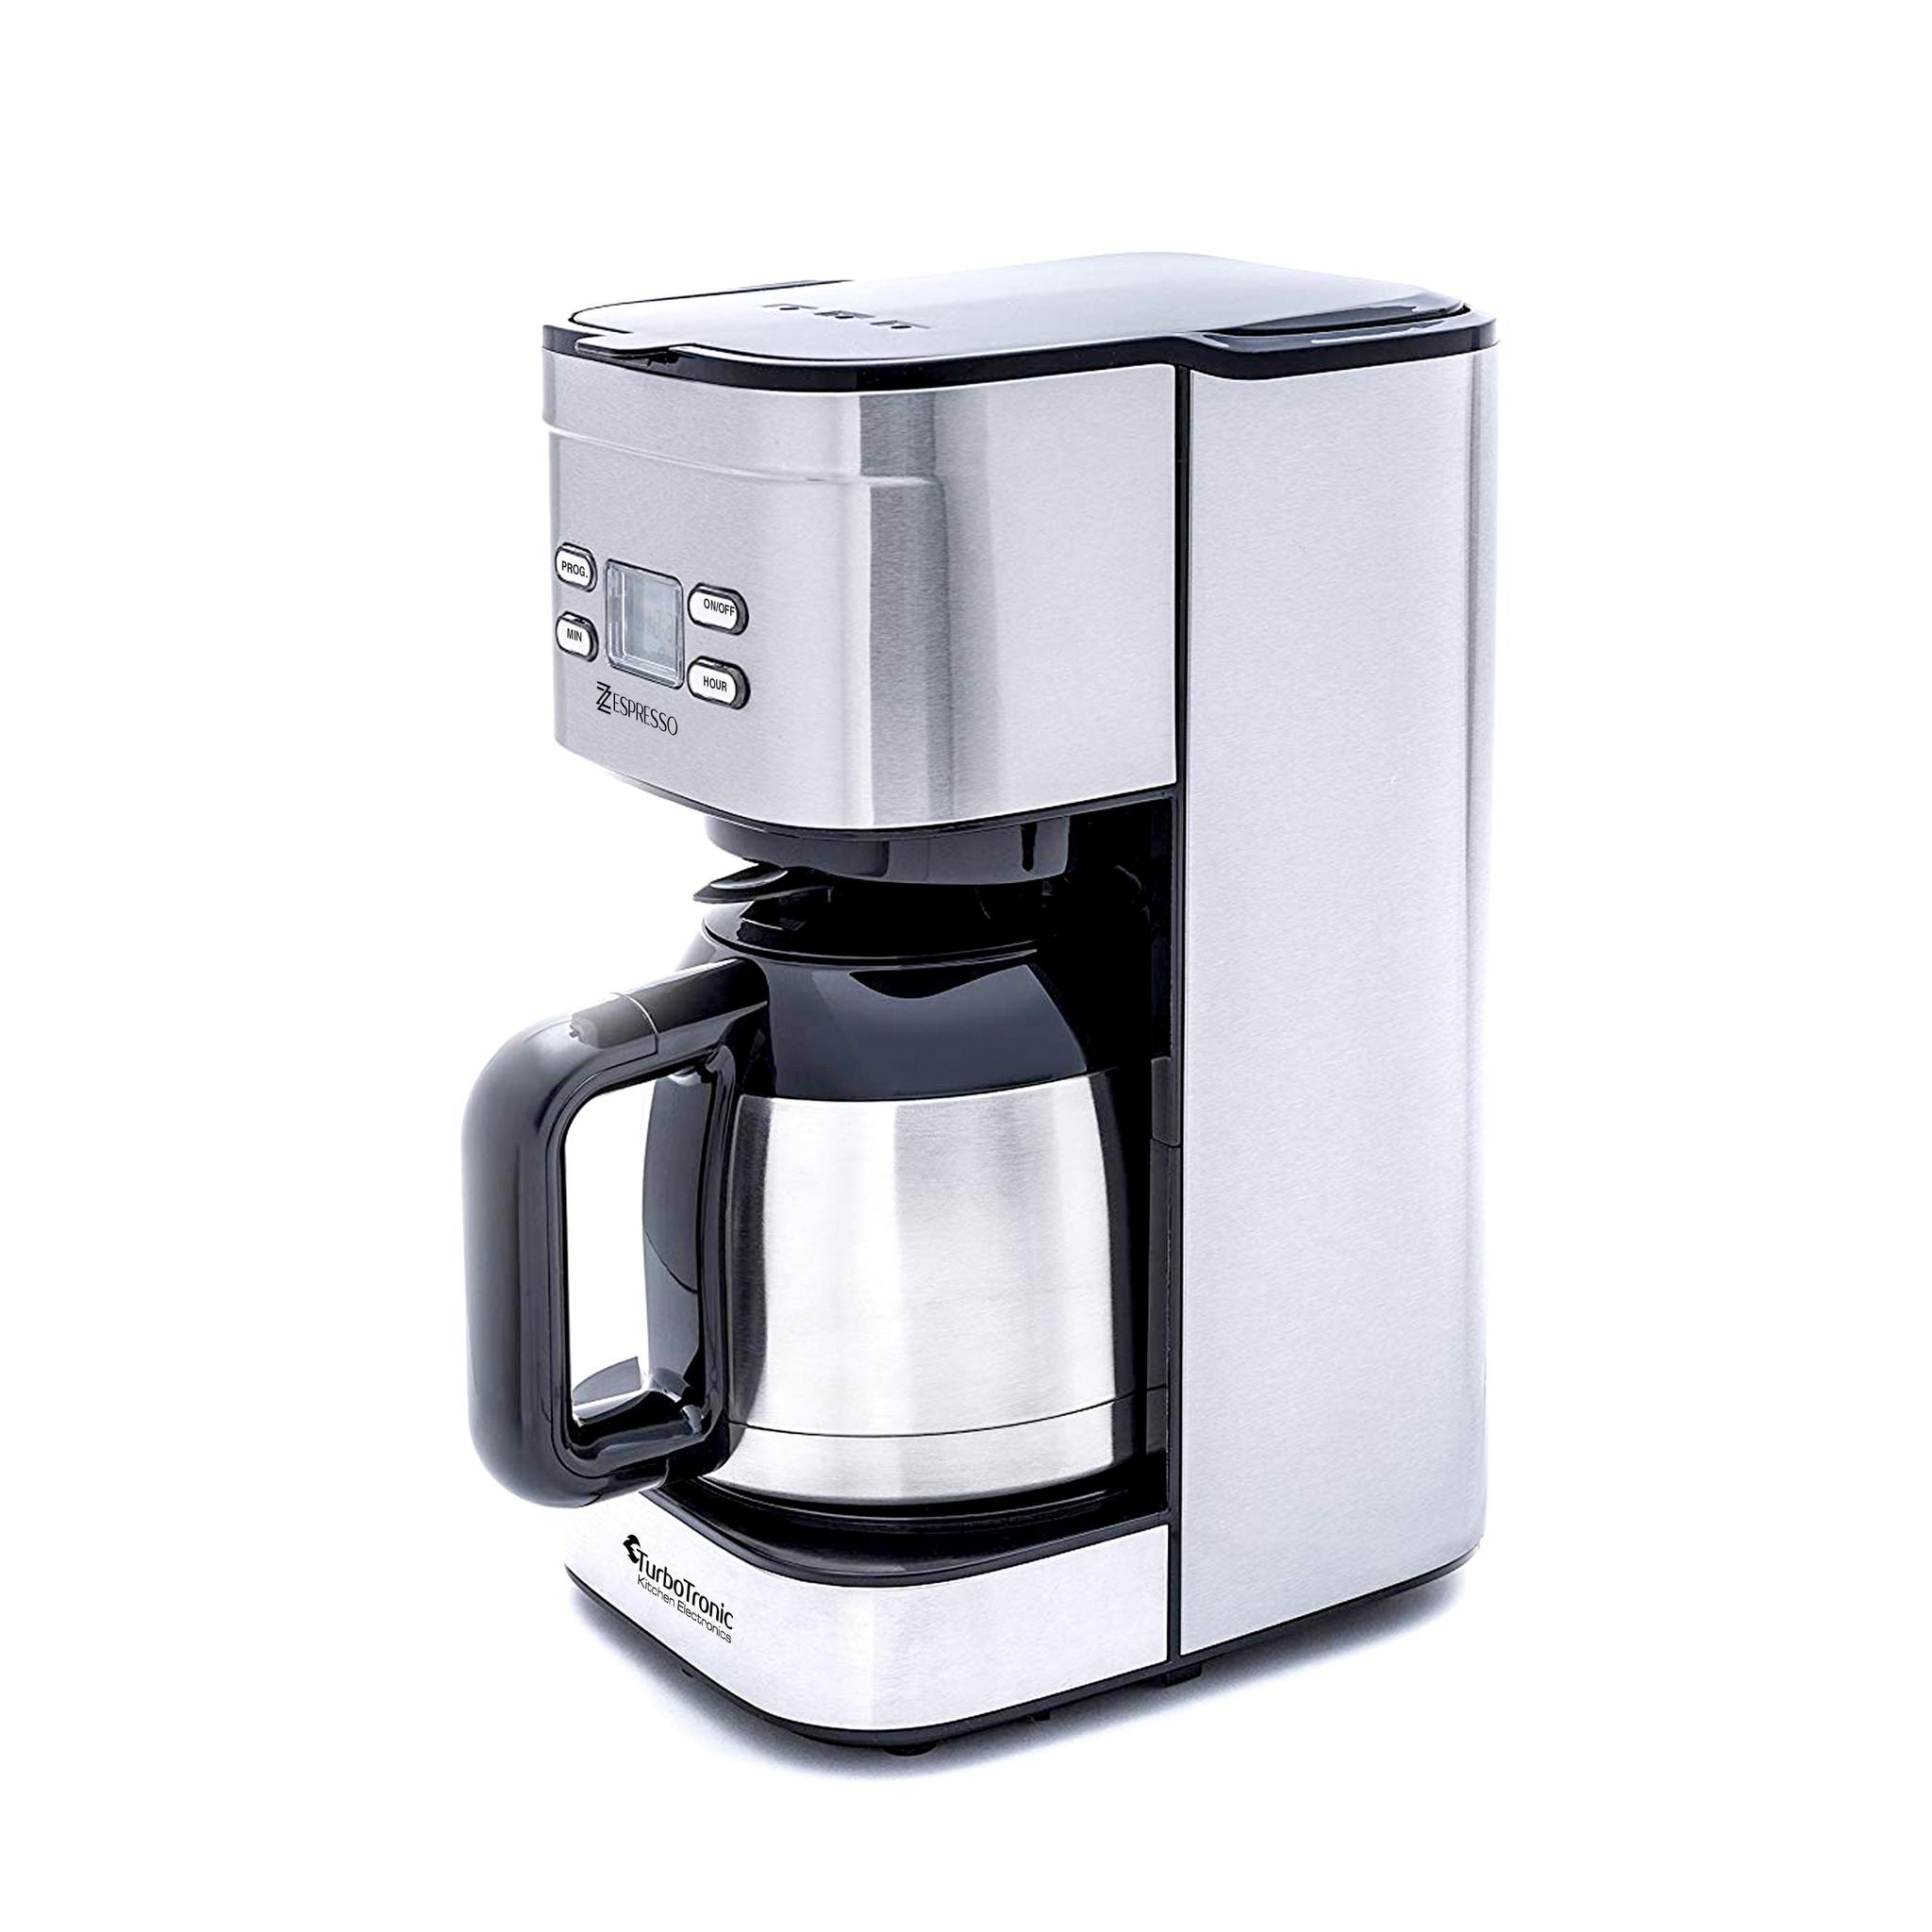 TurboTronic Koffiezetapparaat